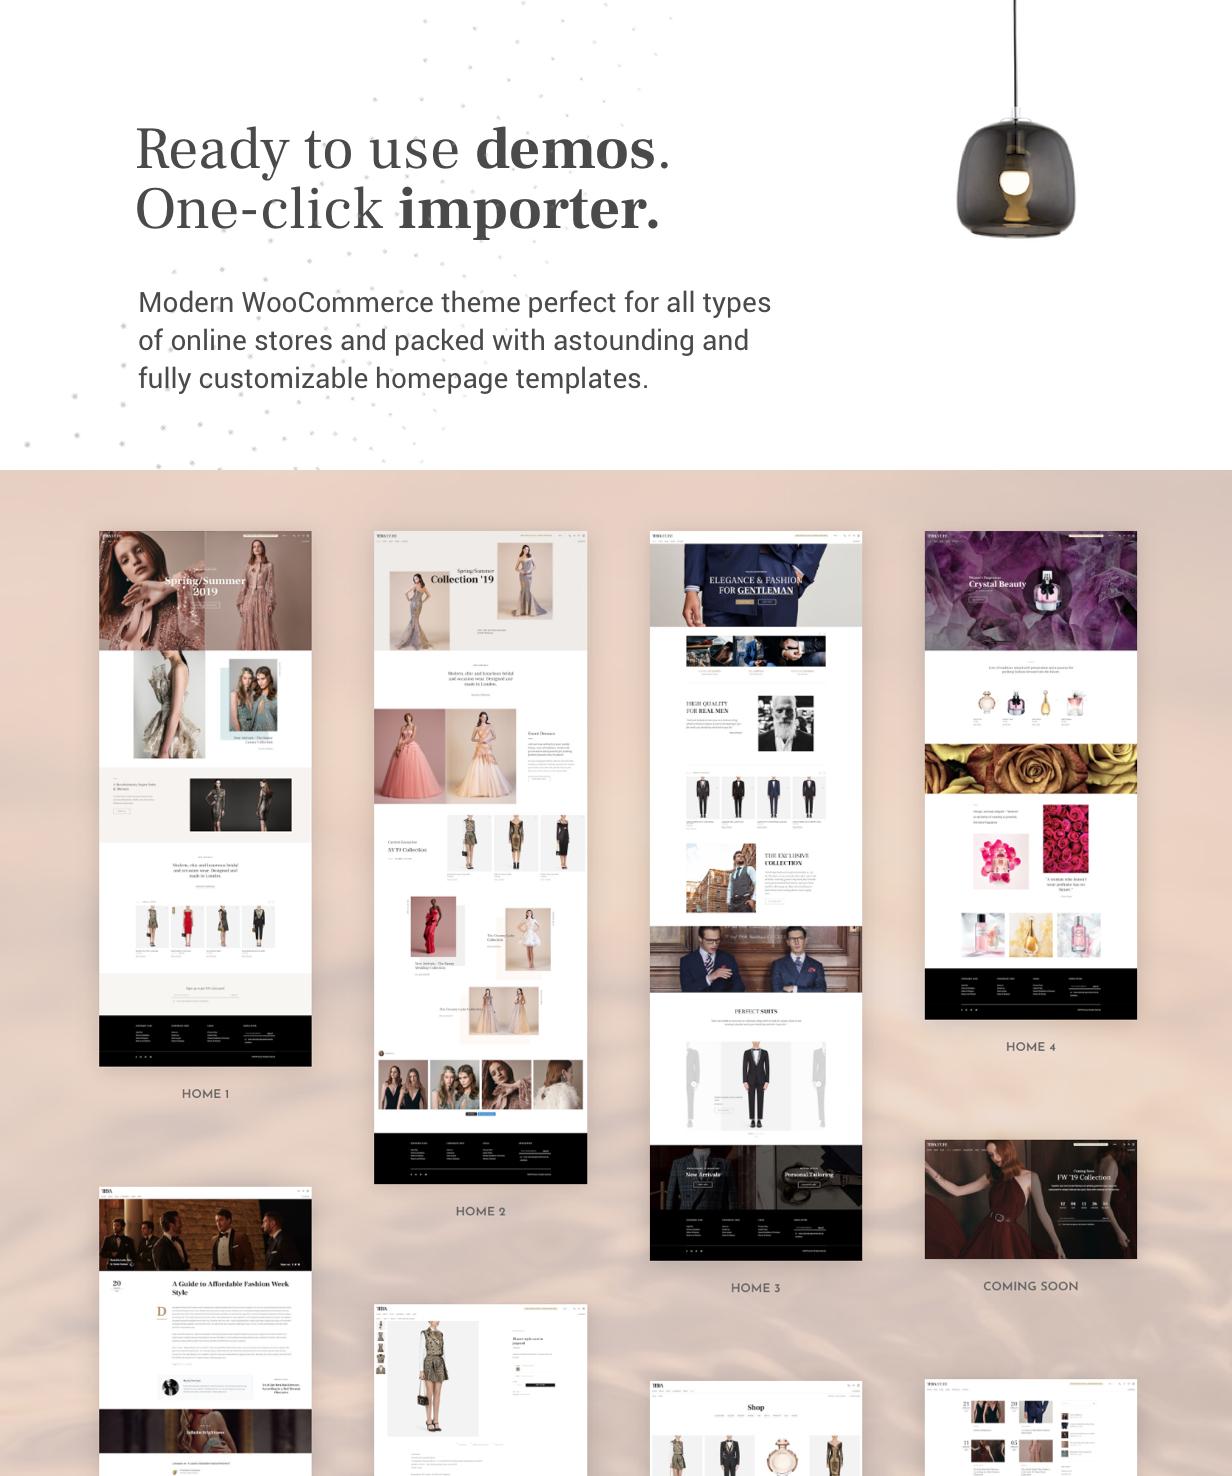 Tera - Modernes WooCommerce WordPress Theme - 1